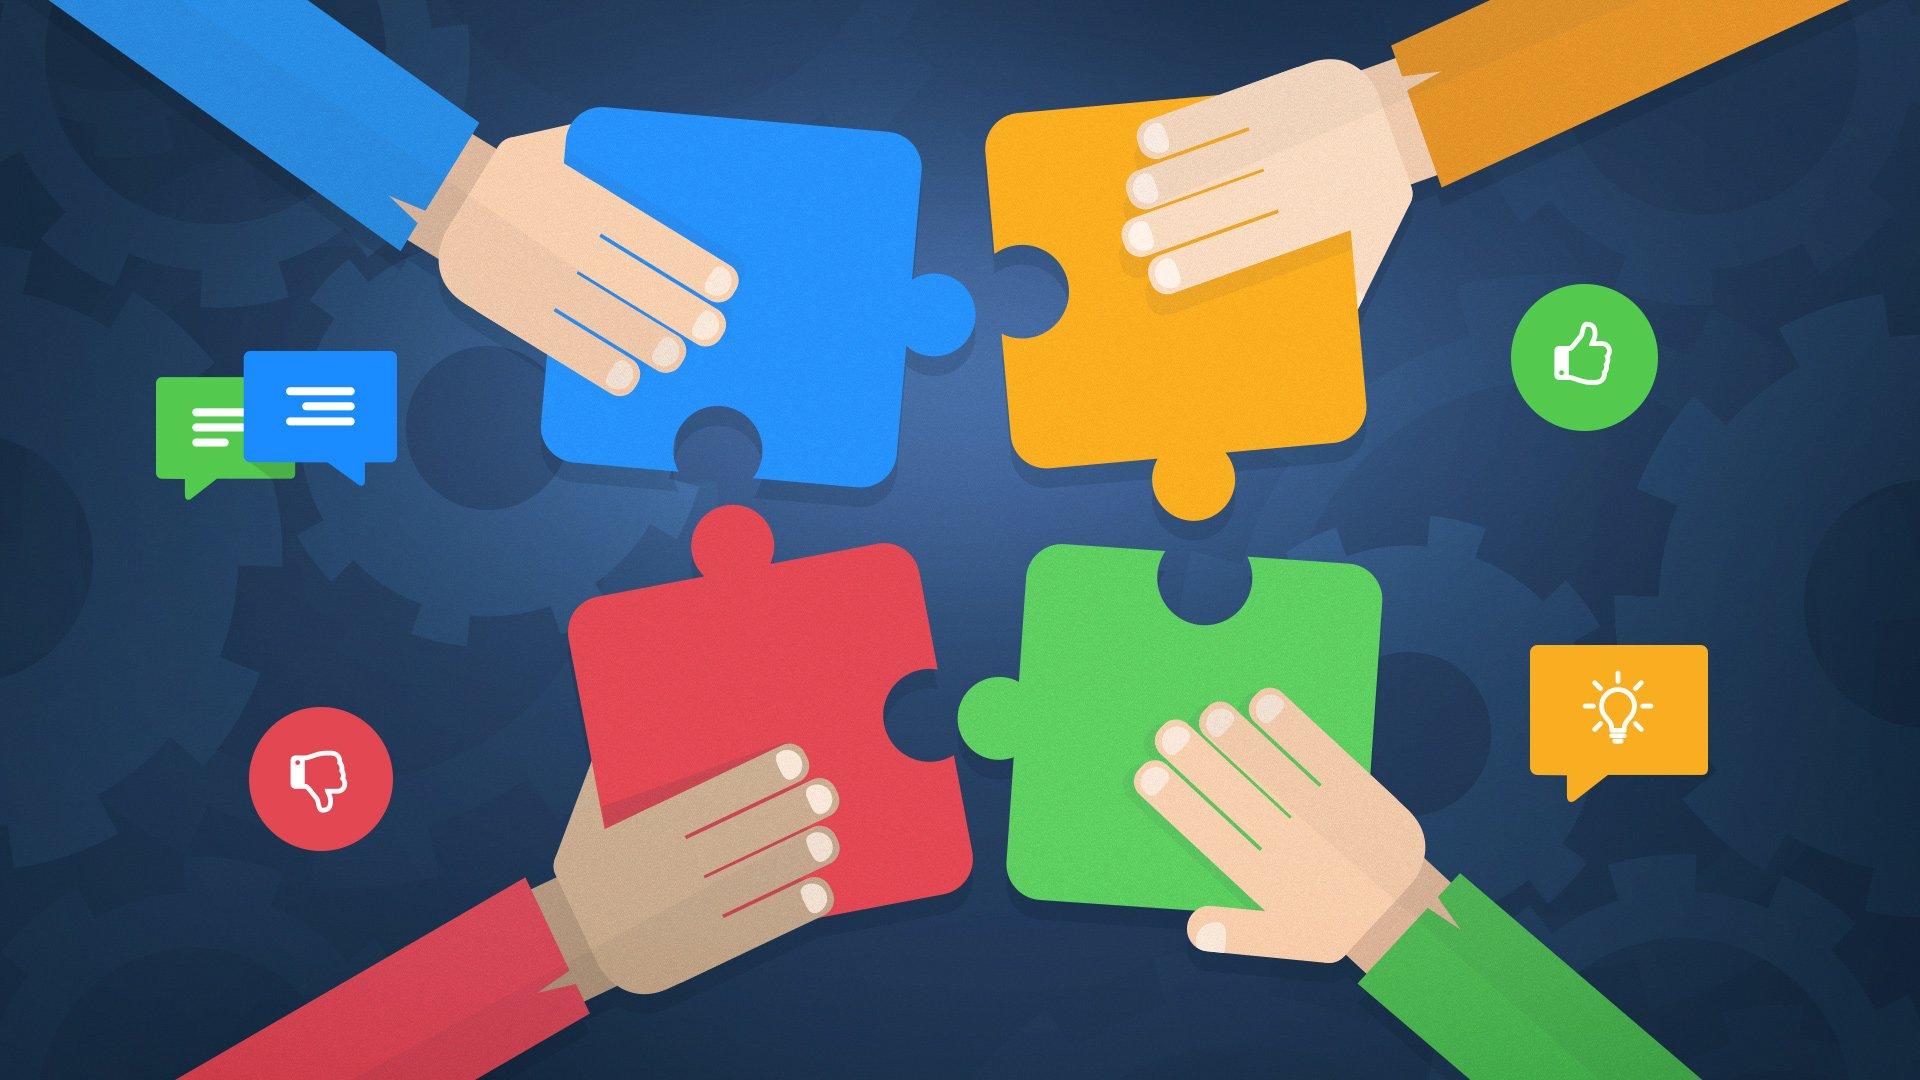 9 Ways to Build Trust in a Team | Teamwork.com High Performance Blog